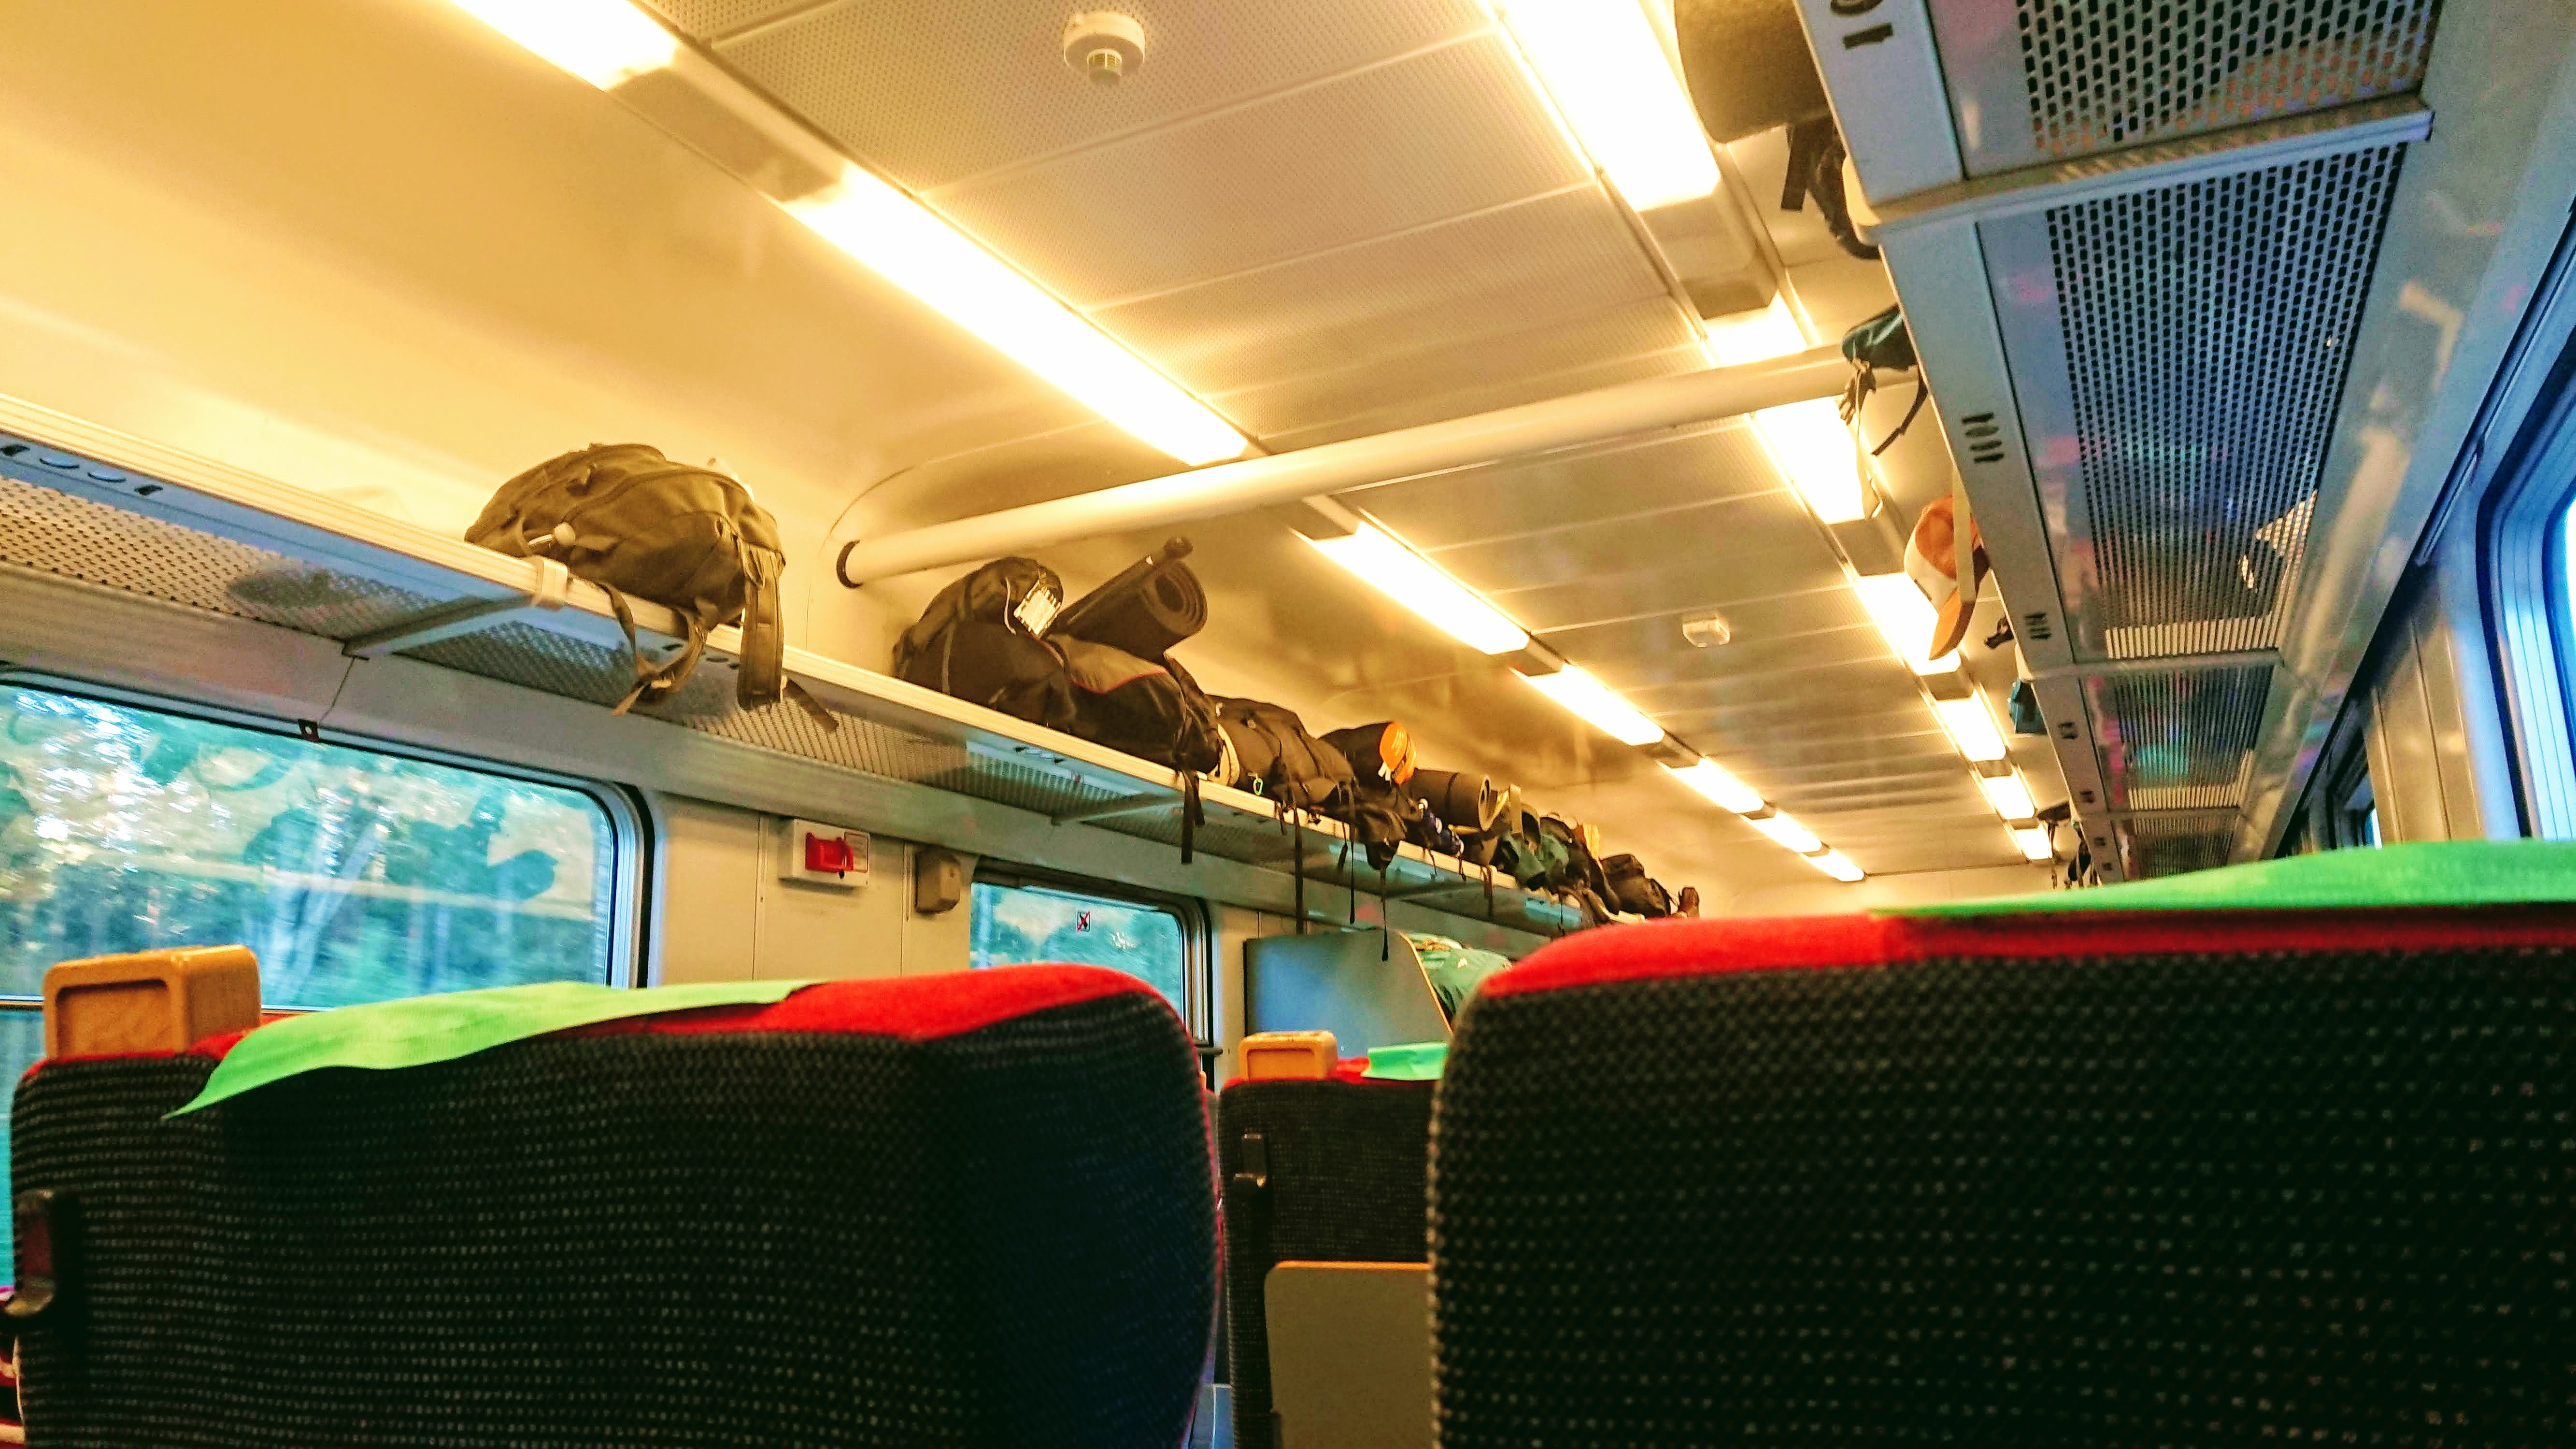 Train full of hikers